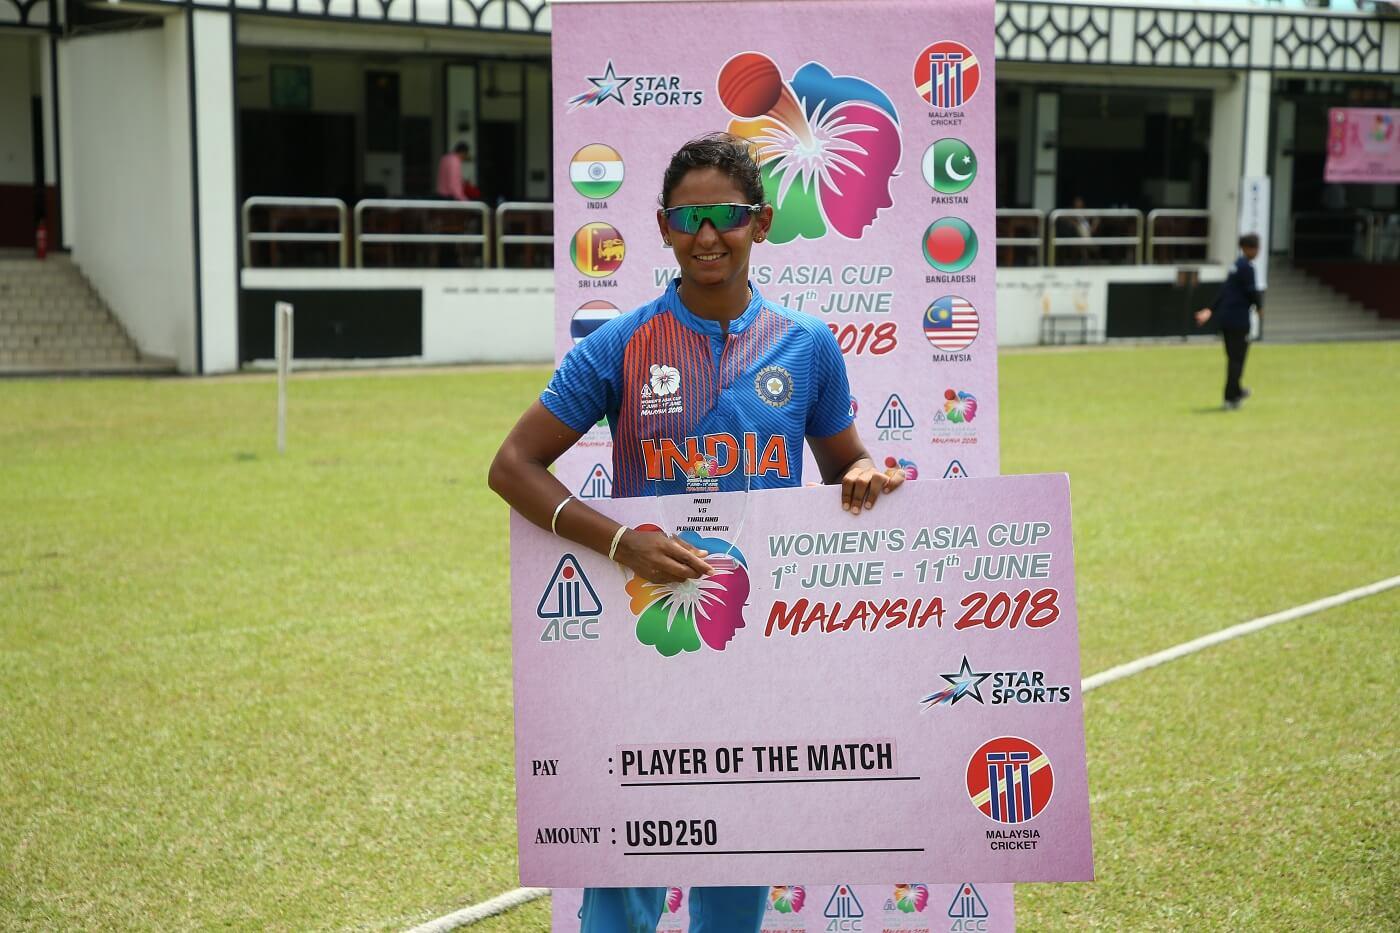 India claim 2nd successive win